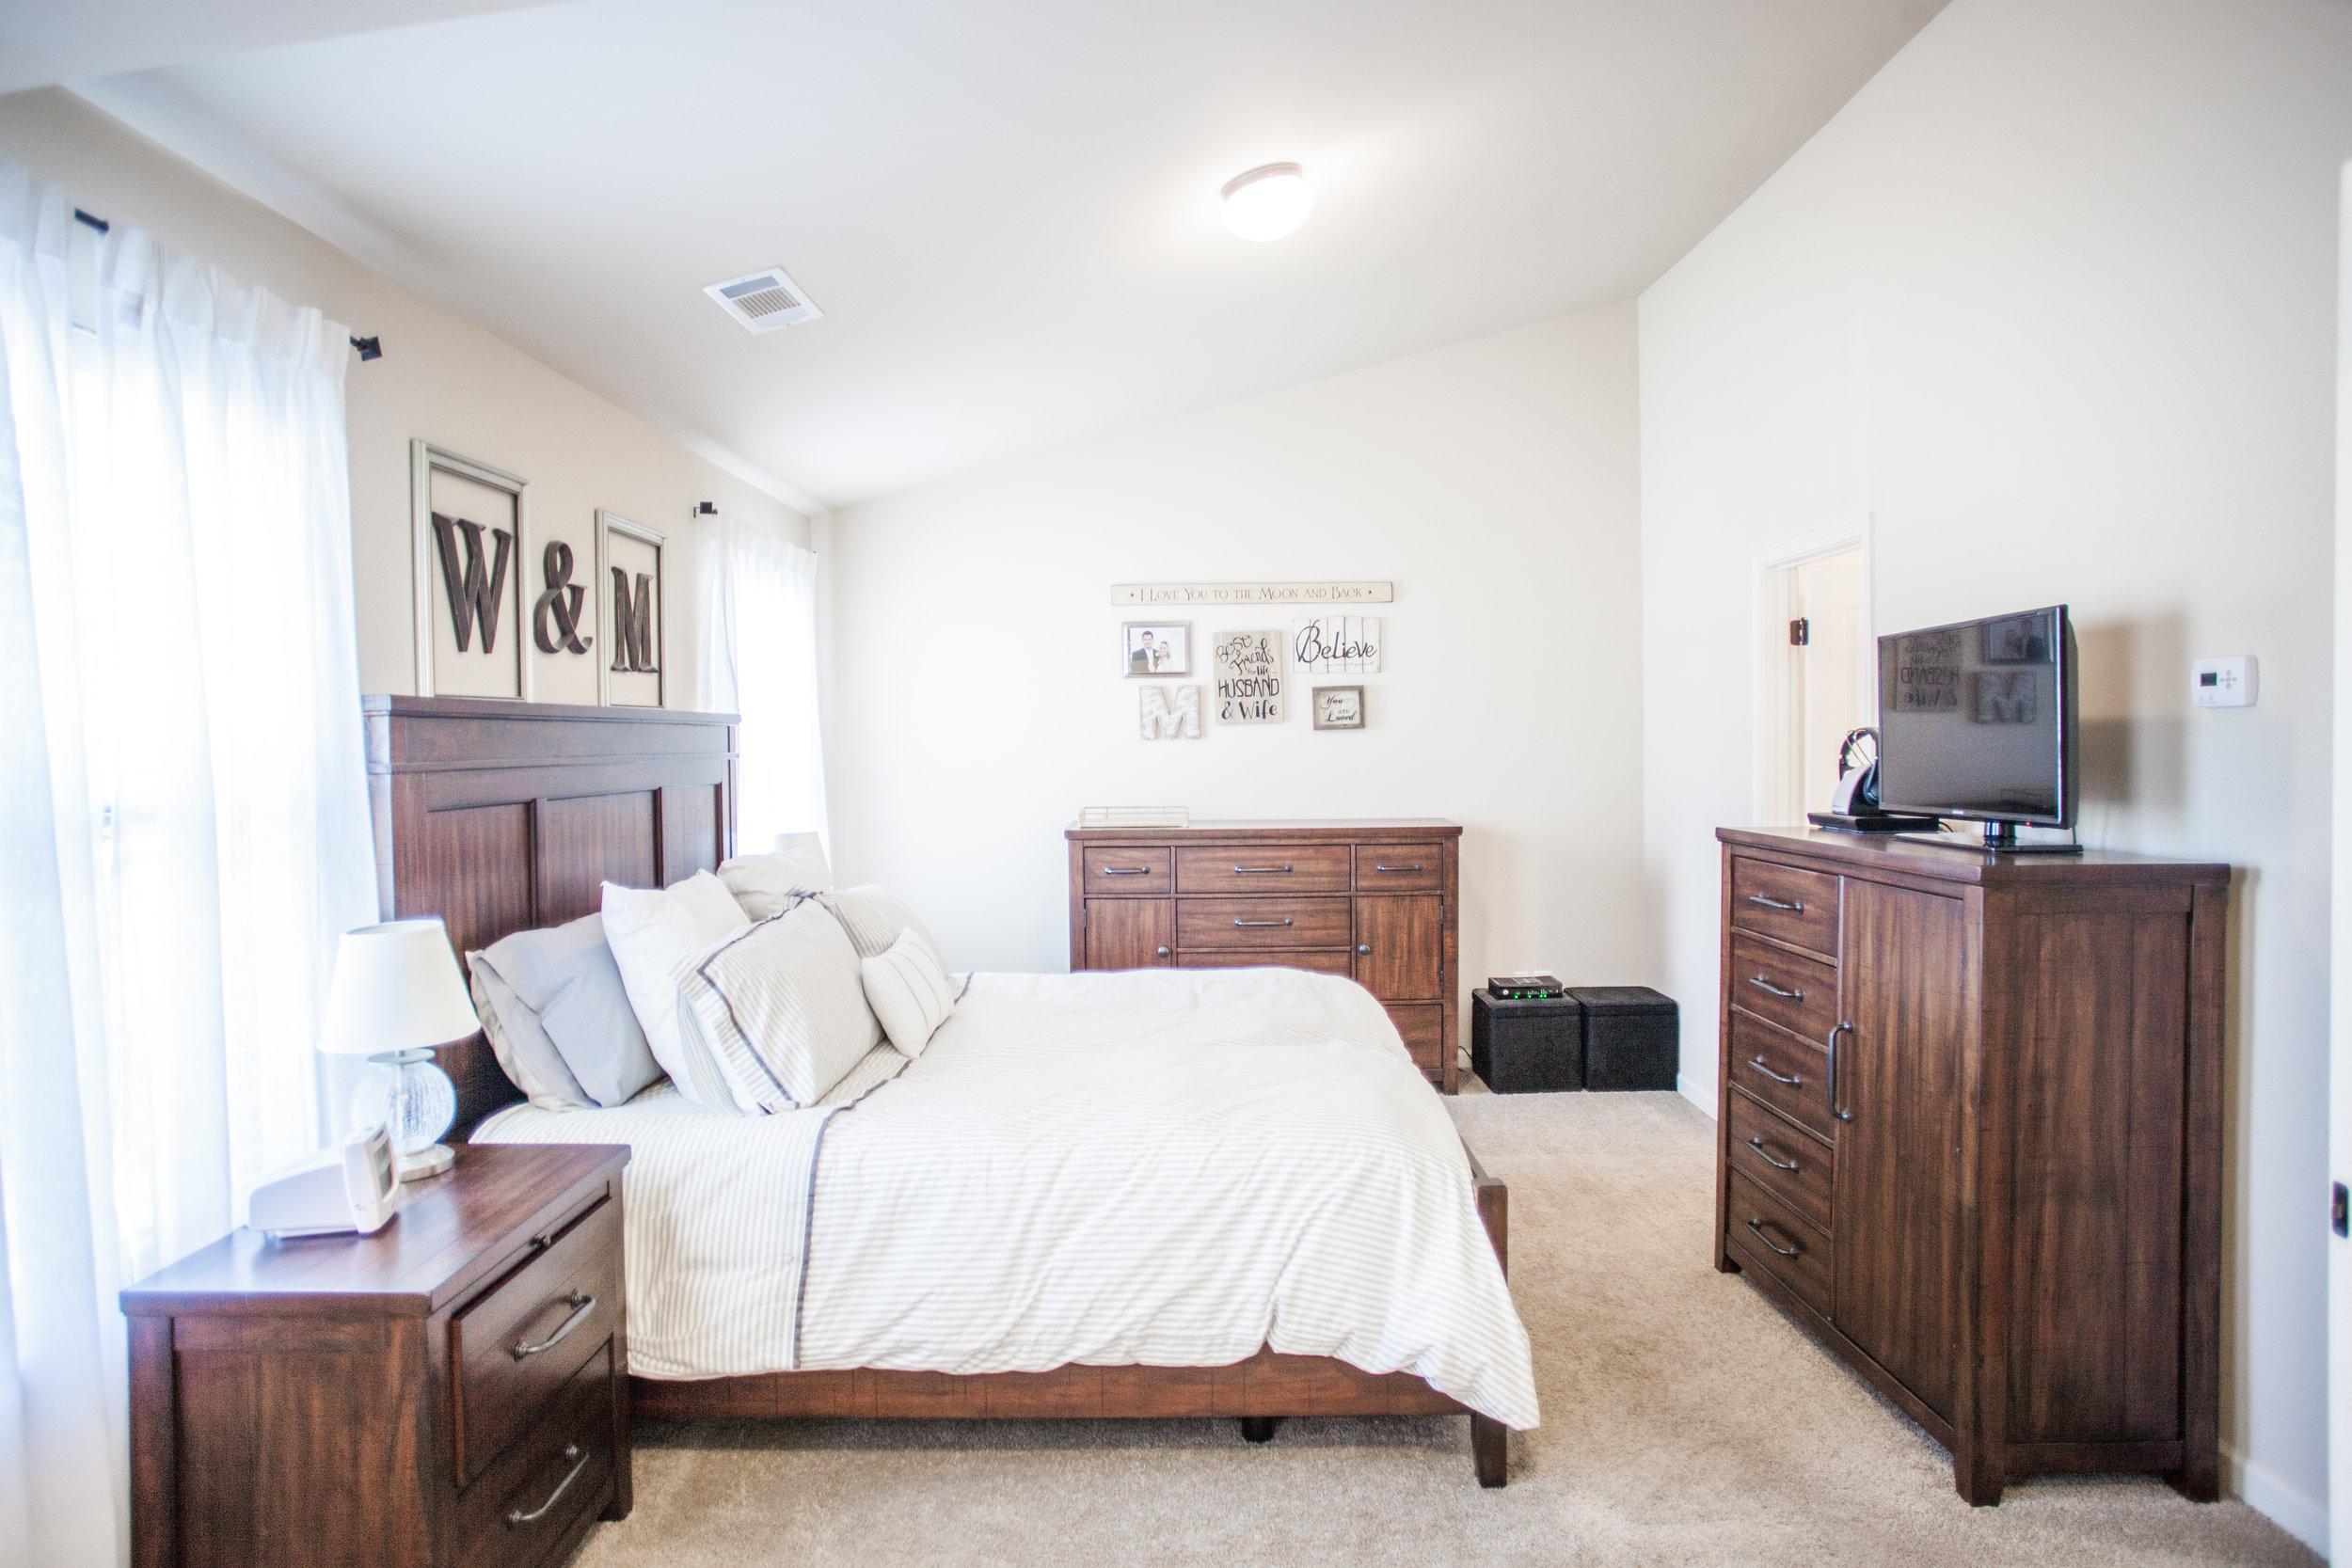 woodstock-ga-house-for-sale-wingard-real-estate-under-300k-16.jpg